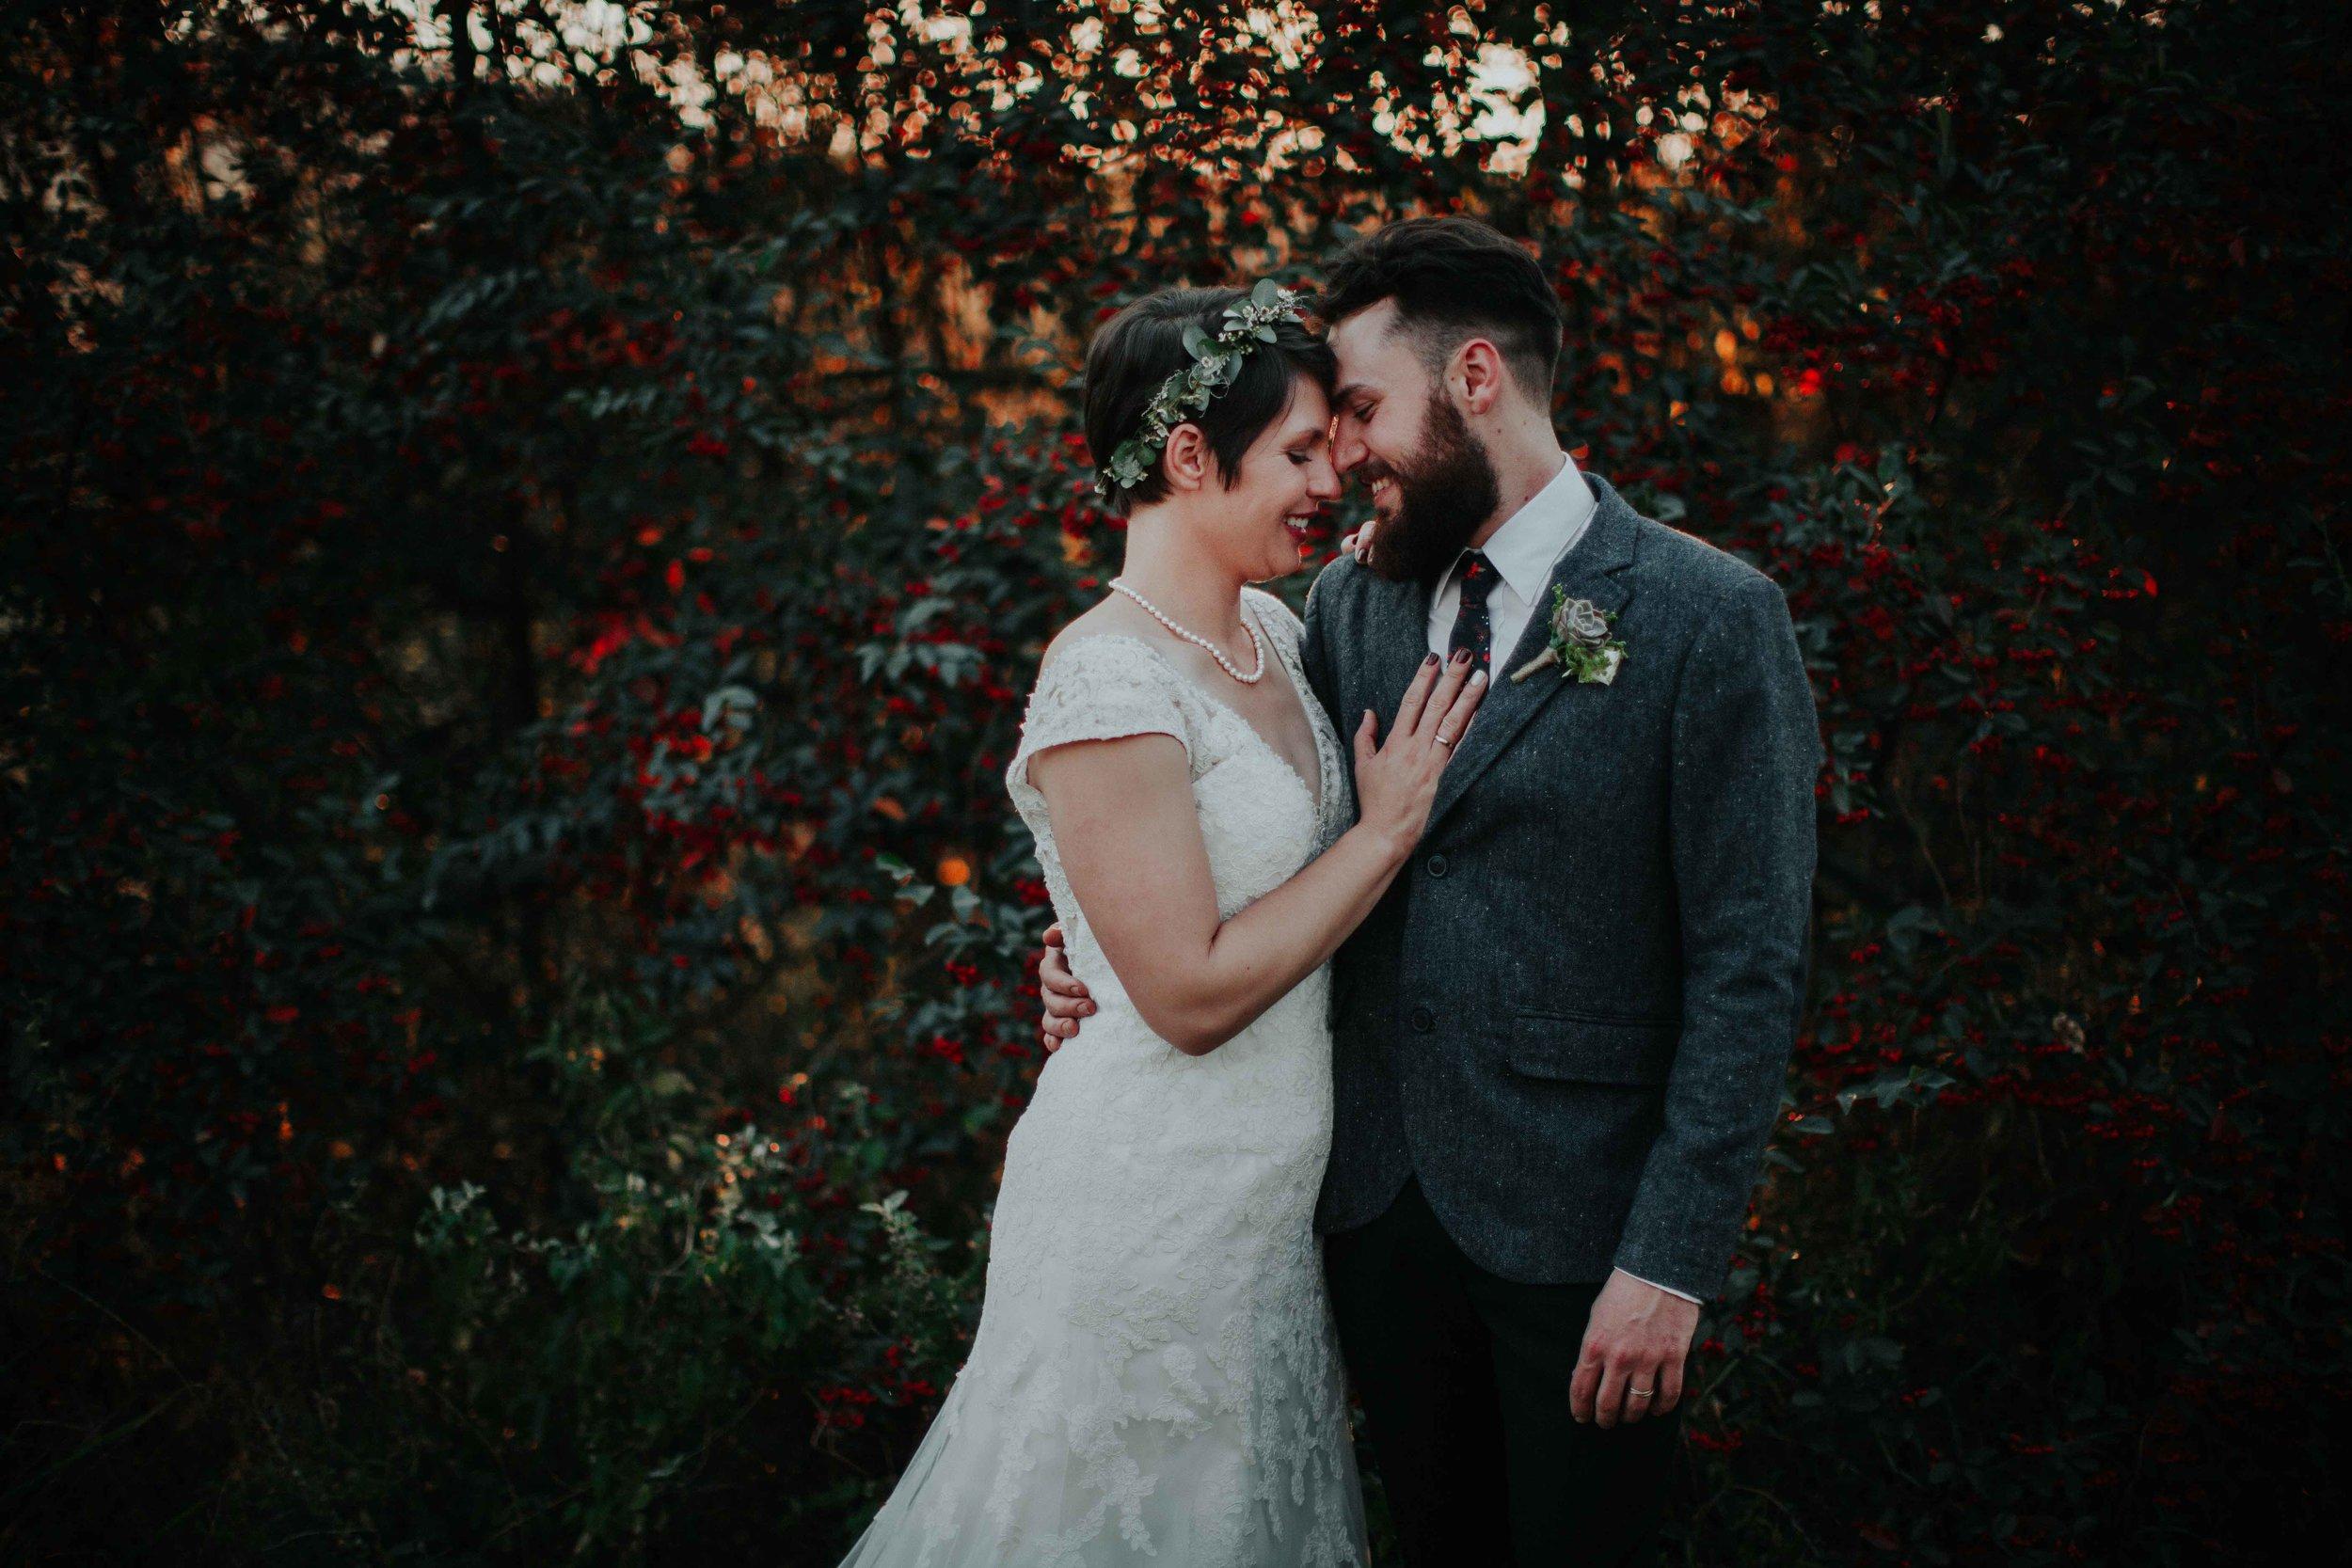 Kristi Smith Photography_Eloff&Jeanette_ Wedding Photographer 27.jpg